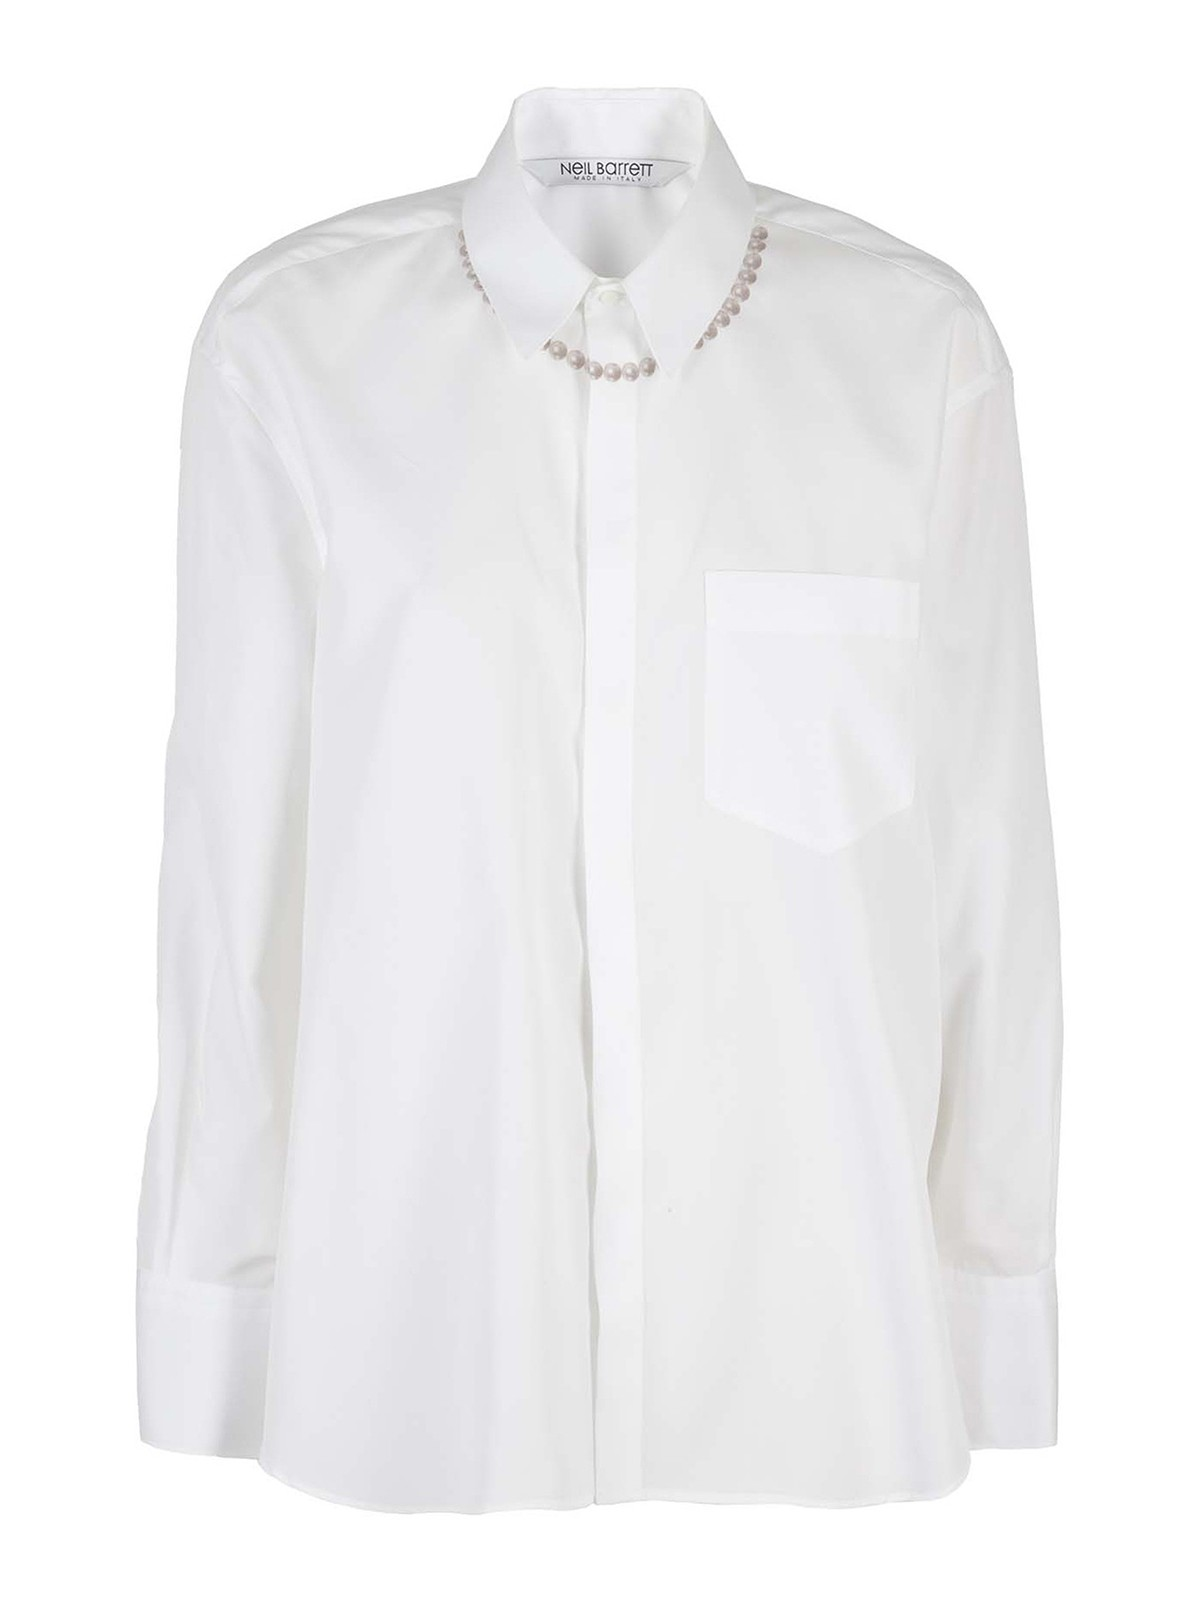 Neil Barrett Shirts BEADS EMBELLISHED SHIRT